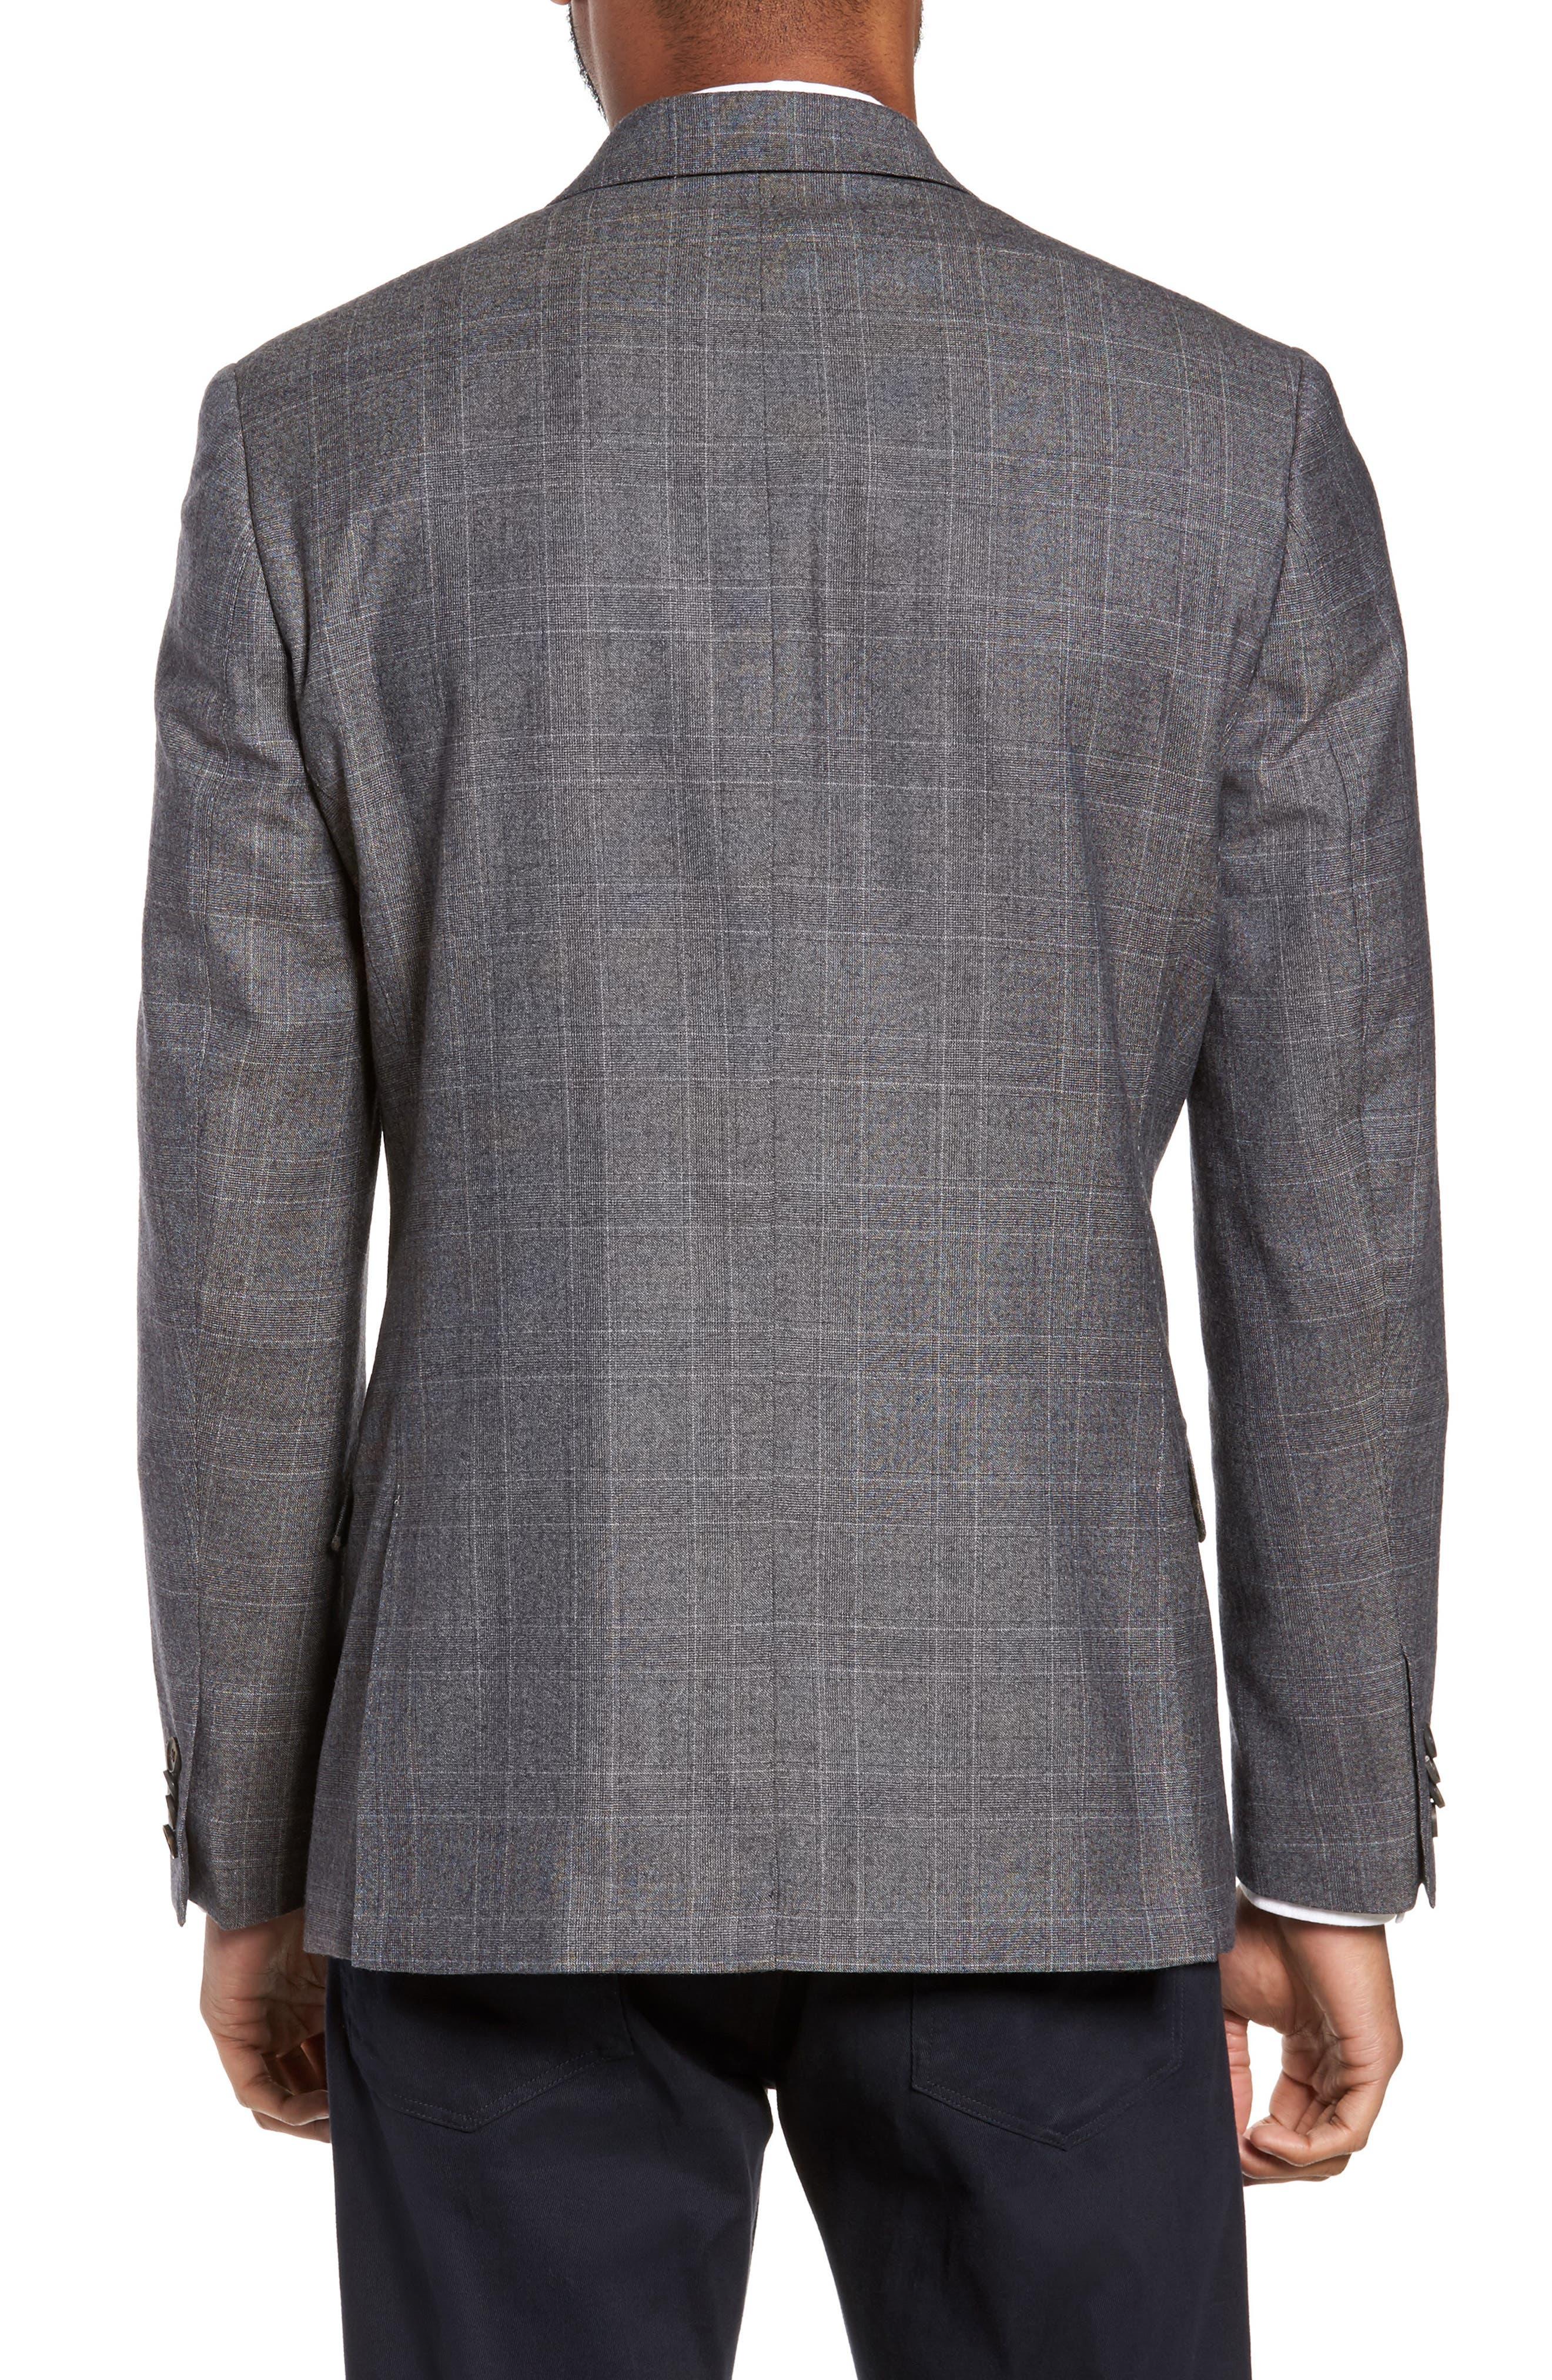 Gryning Trim Fit Plaid Wool Blend Sport Coat,                             Alternate thumbnail 2, color,                             066